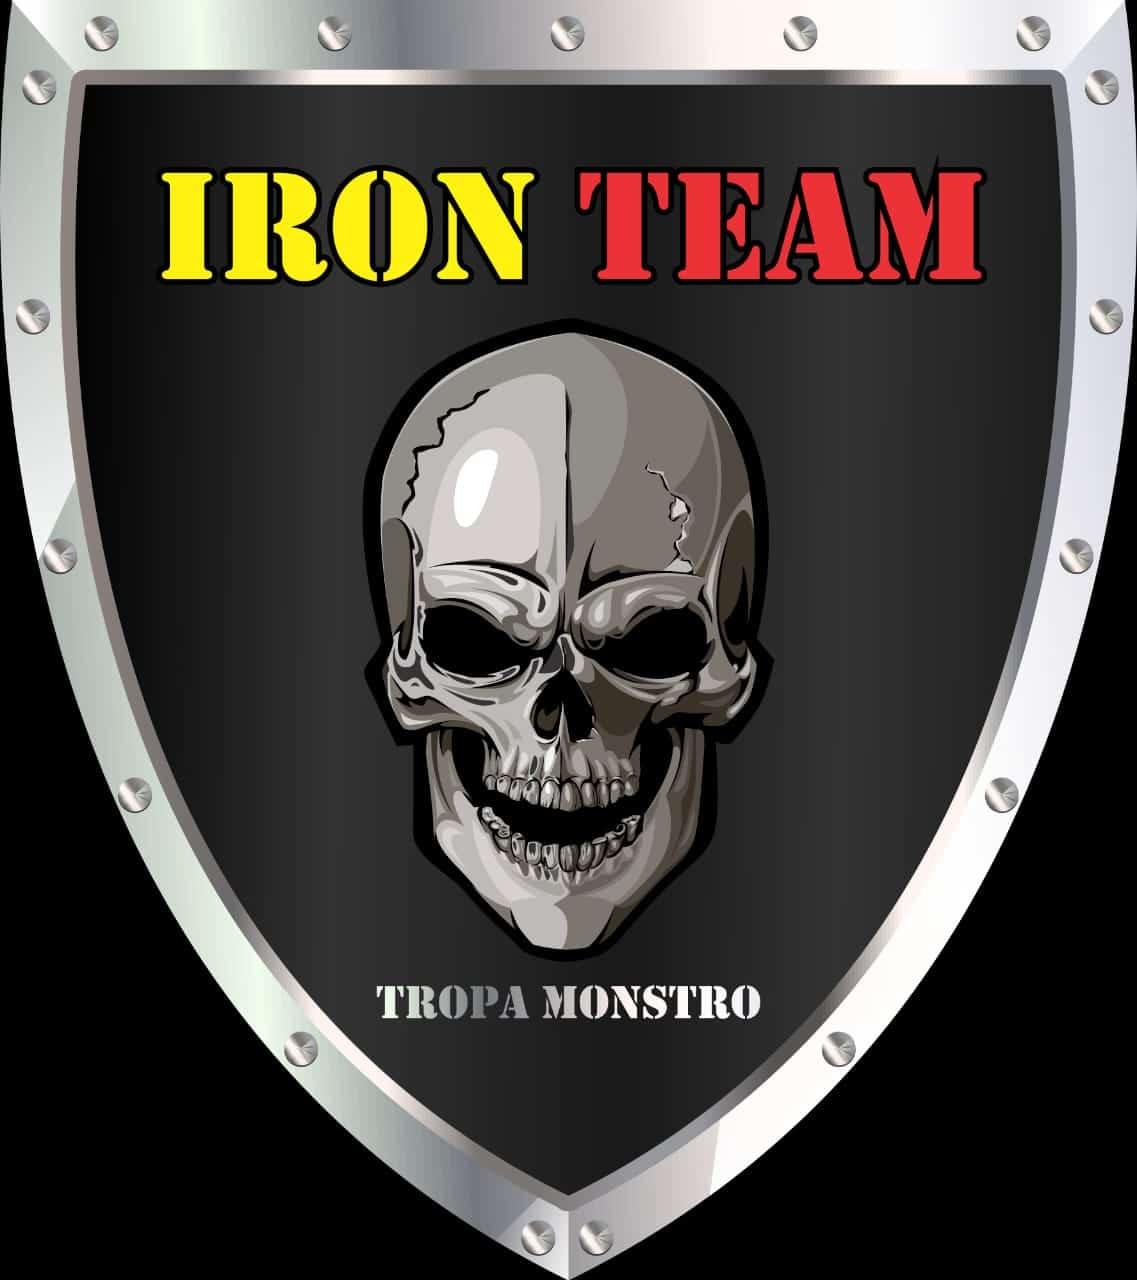 Irom team